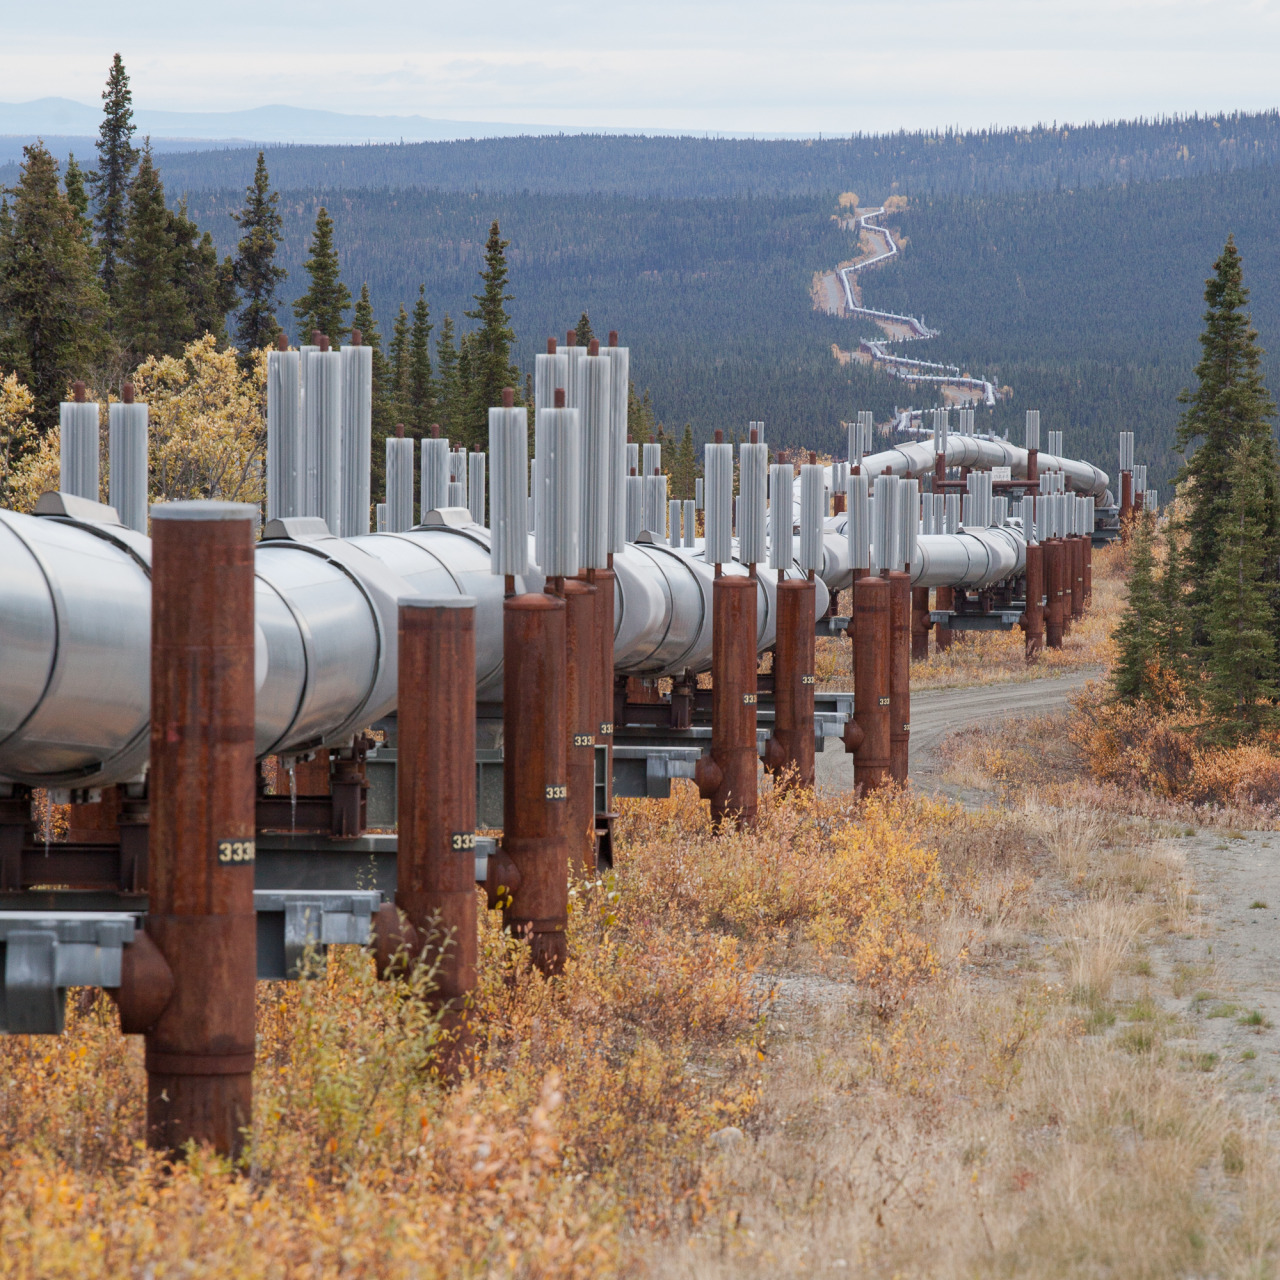 The Alaska Pipeline goes on for 800 miles.